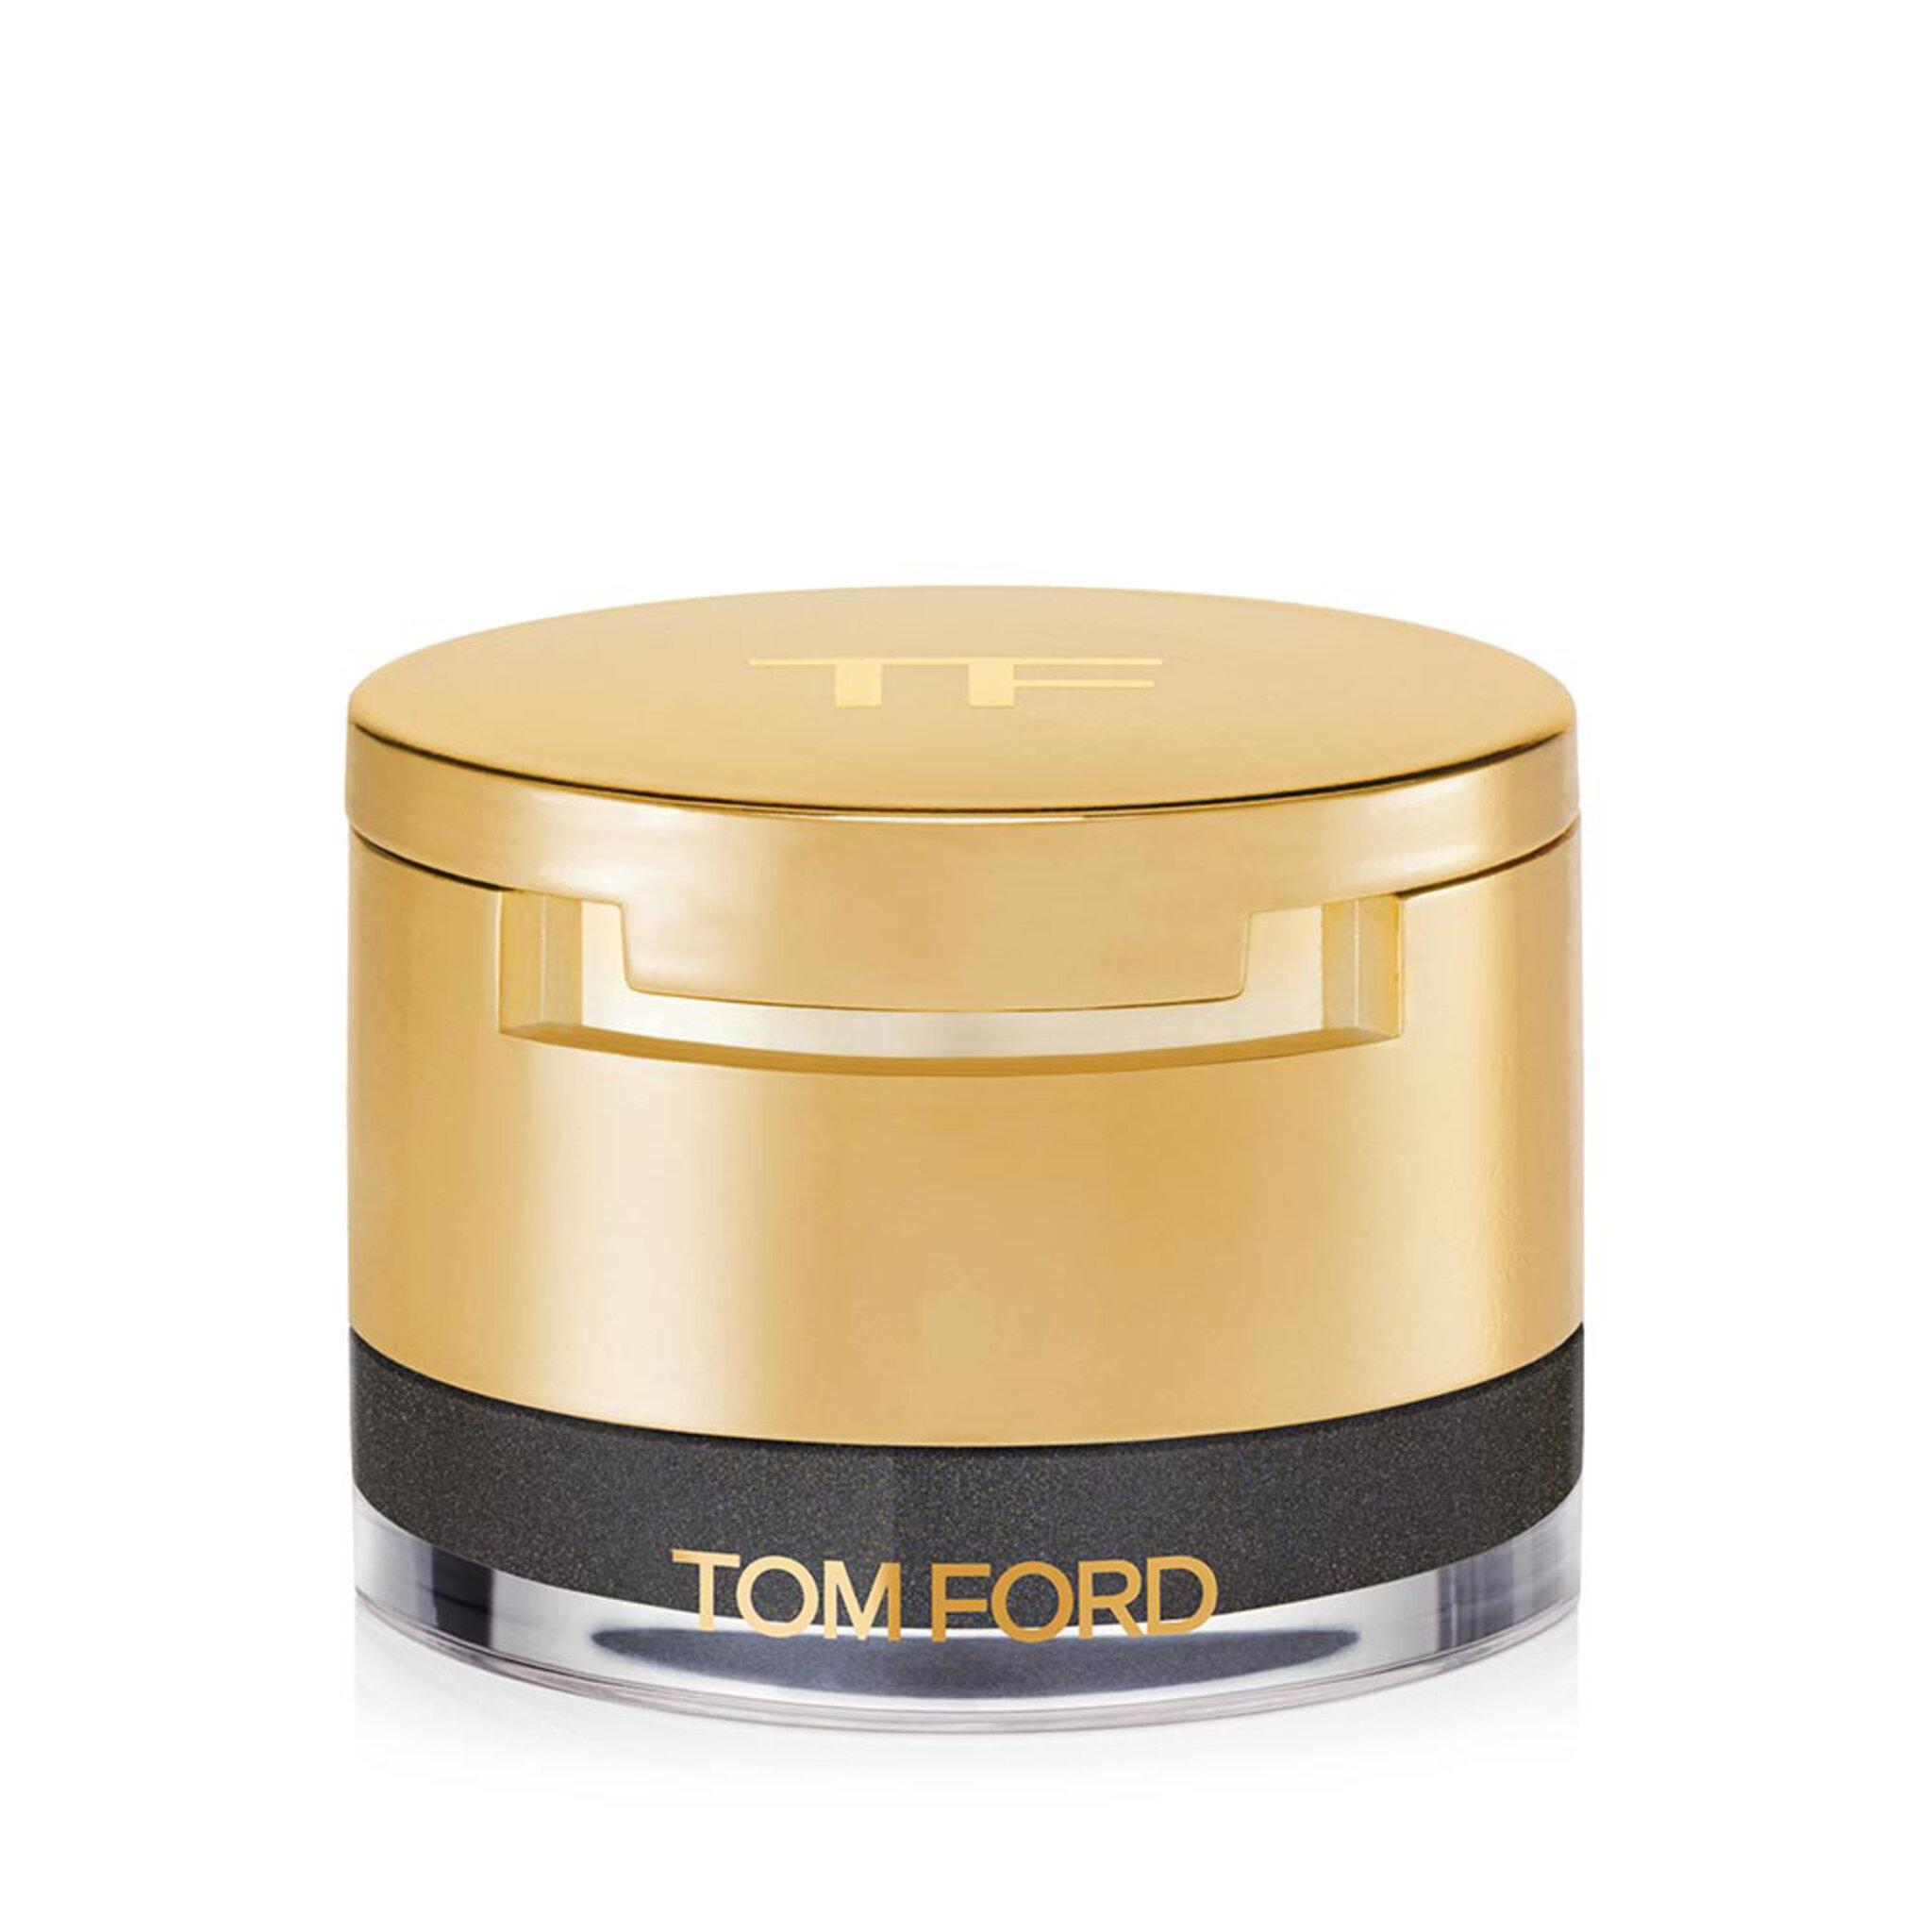 Soleil Cream and Powder Eye Color - Black Sand, 7 ML